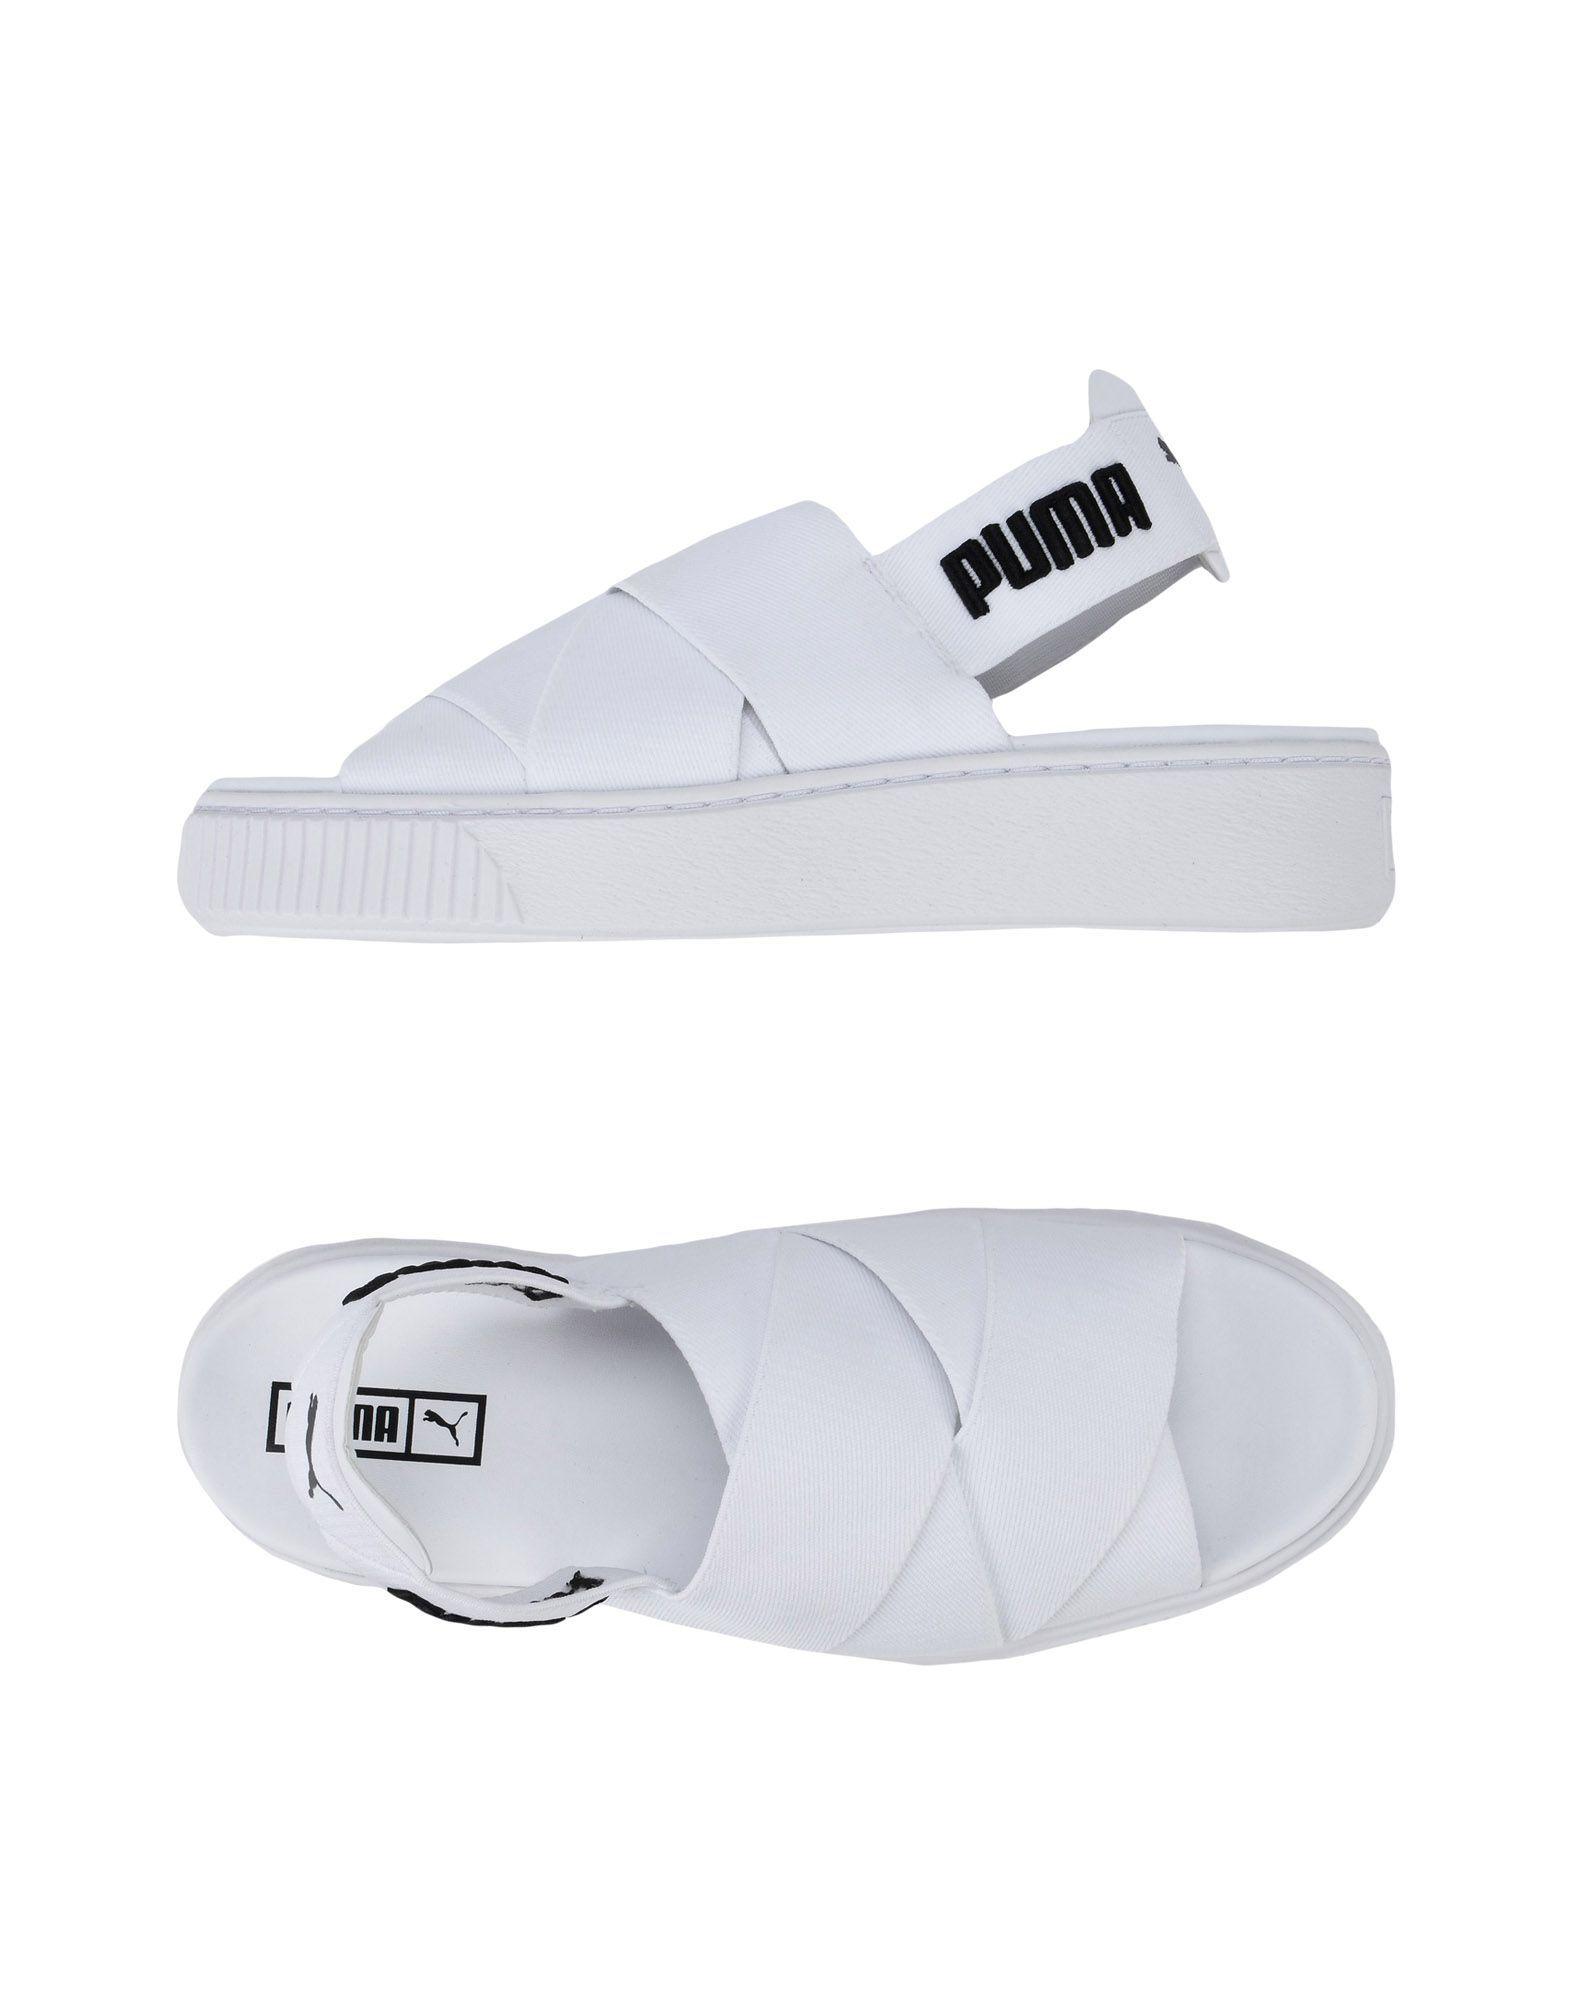 PUMA Sandals - Footwear   YOOX.COM in